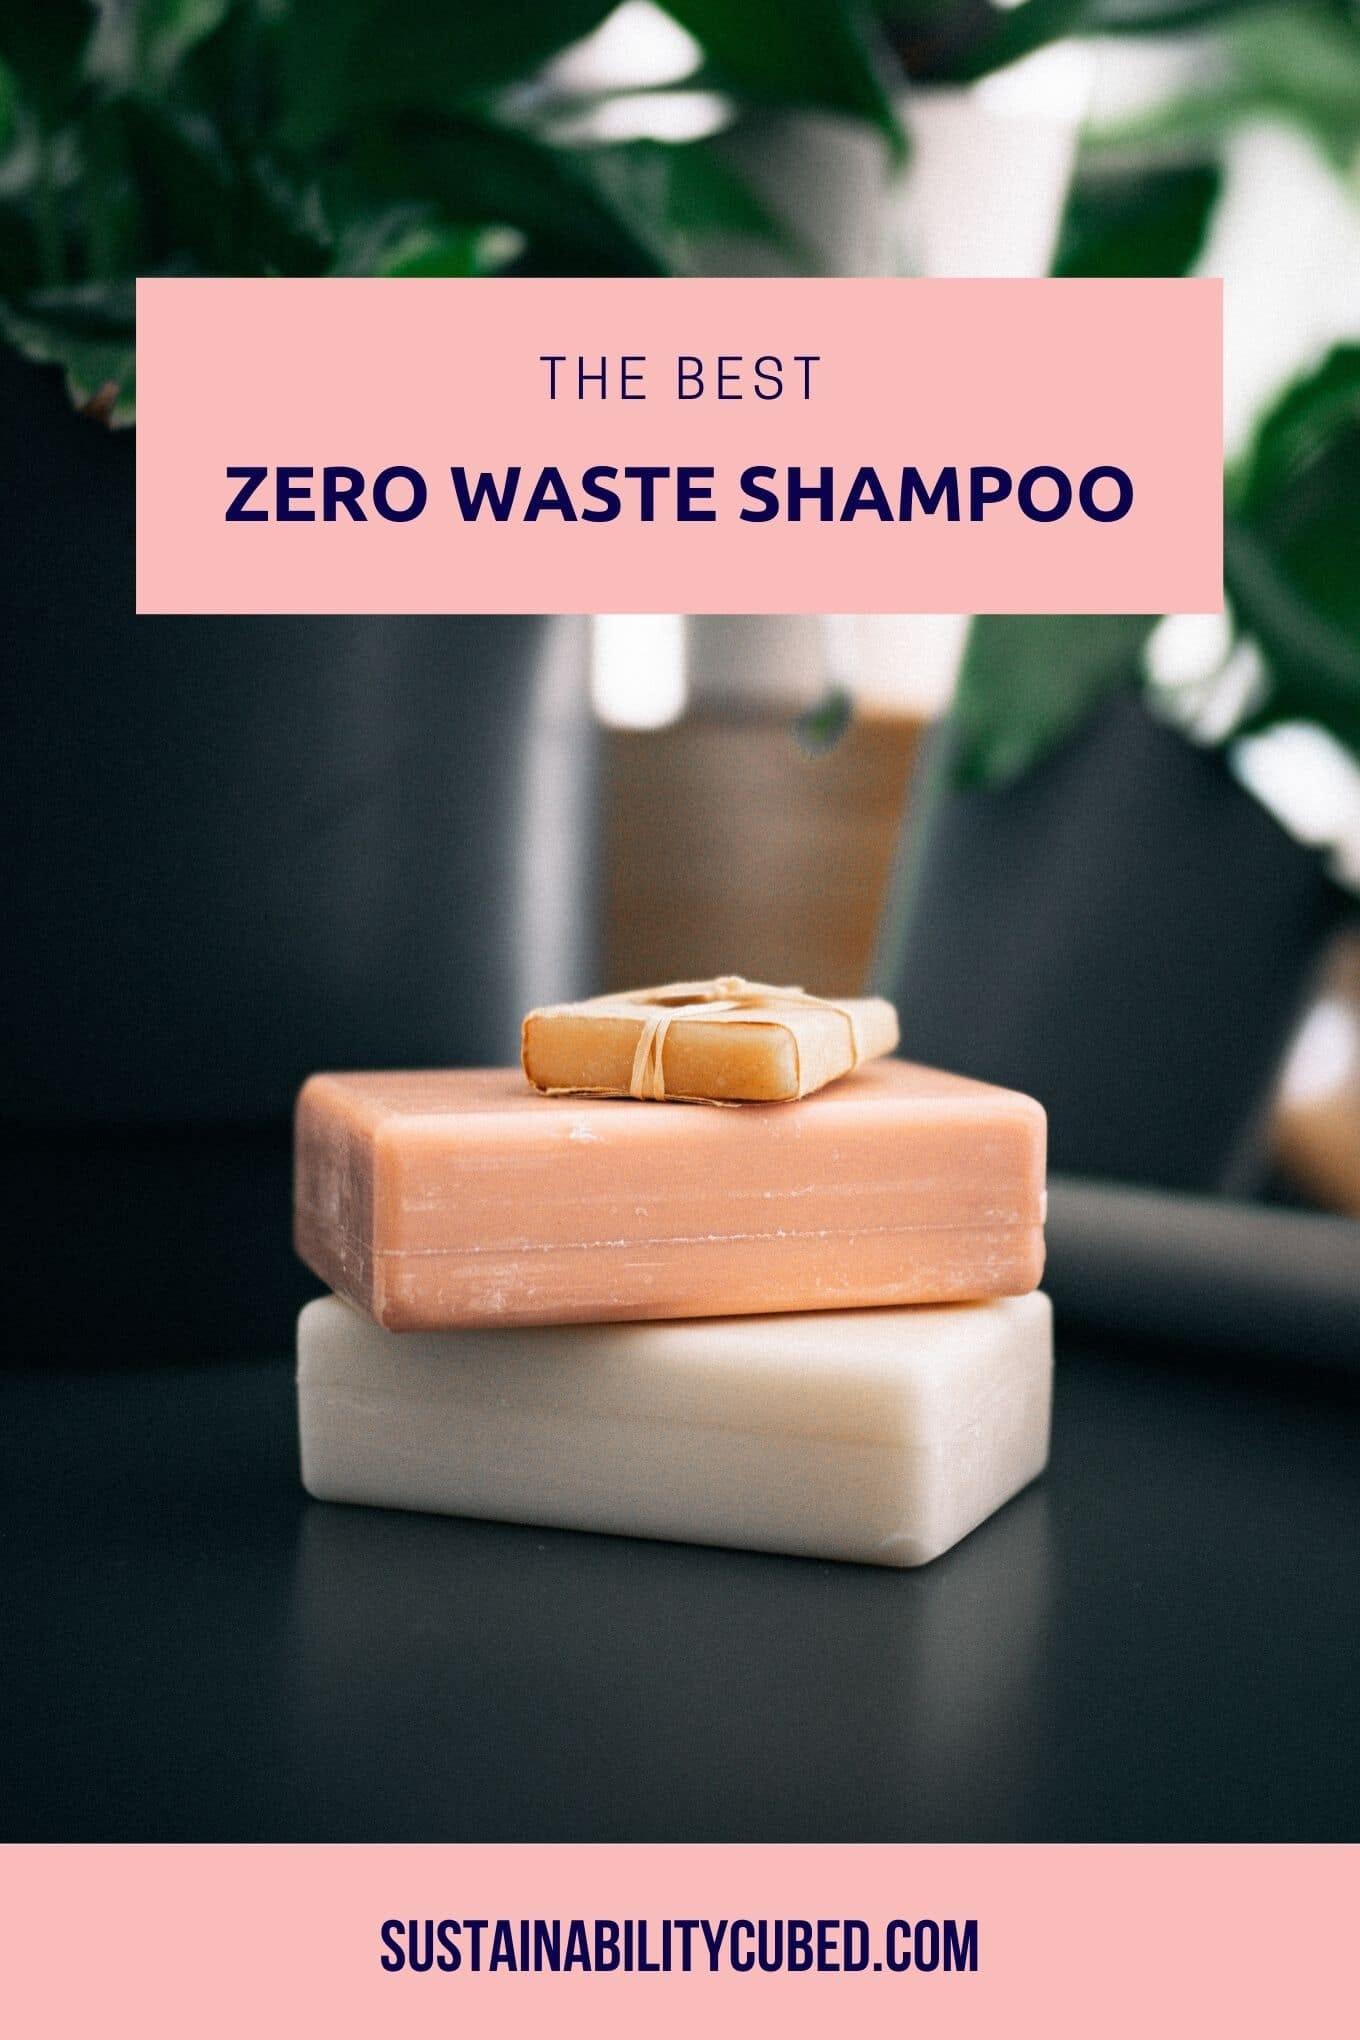 Zero Waste Shampoo